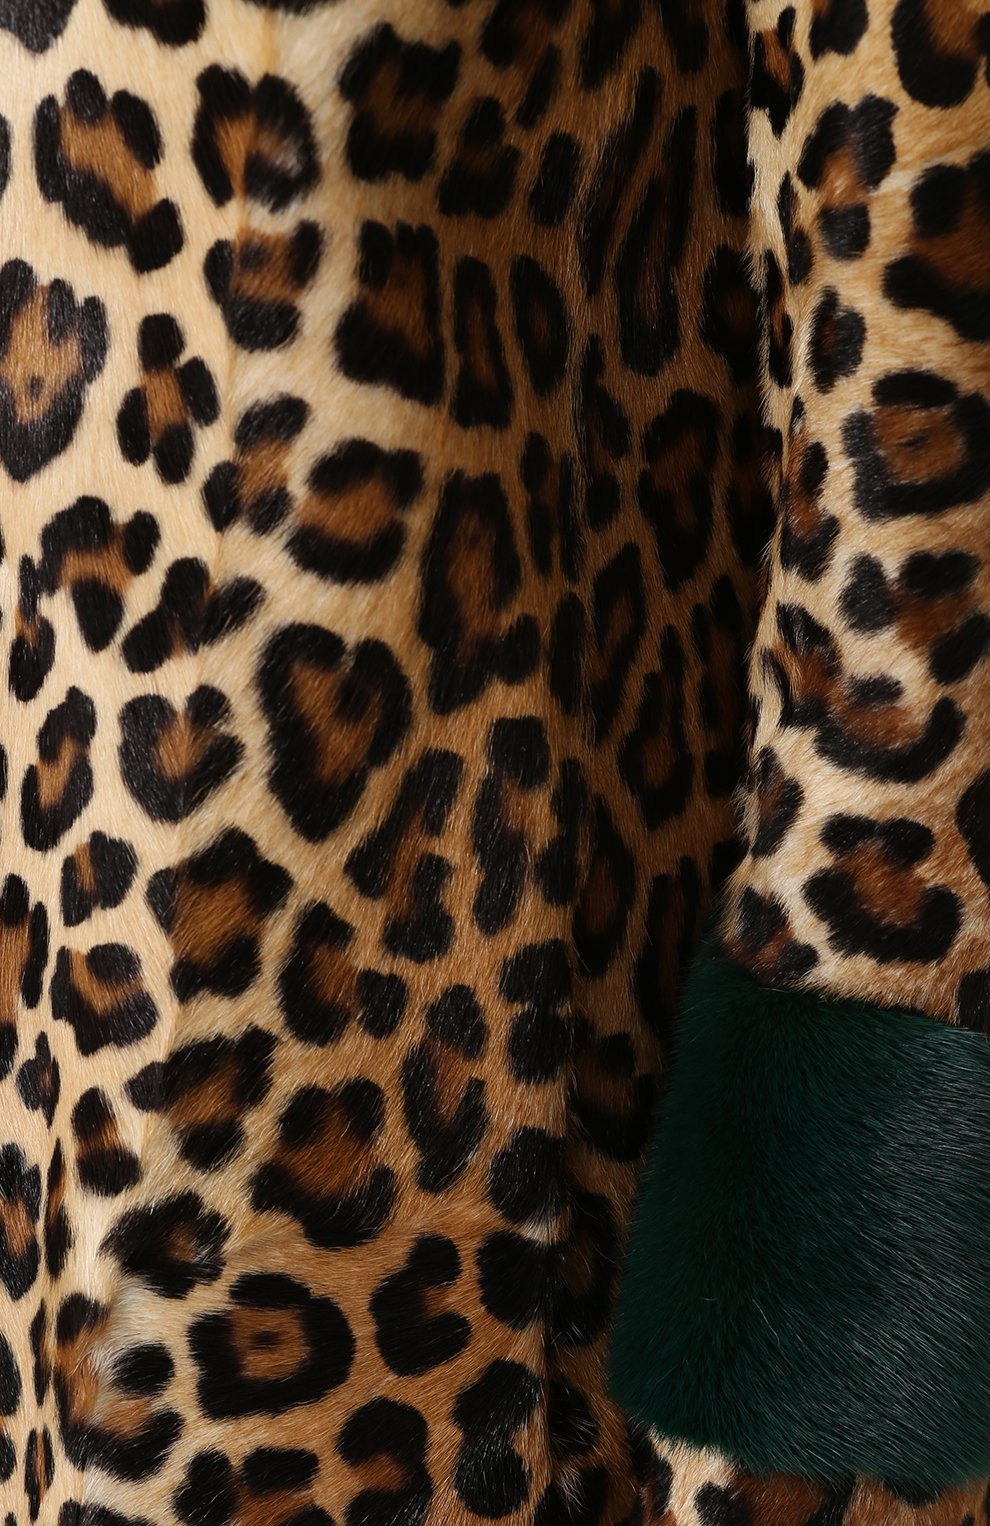 Шуба из меха норки и козлика с леопардовым принтом Simonetta Ravizza леопардовая   Фото №5